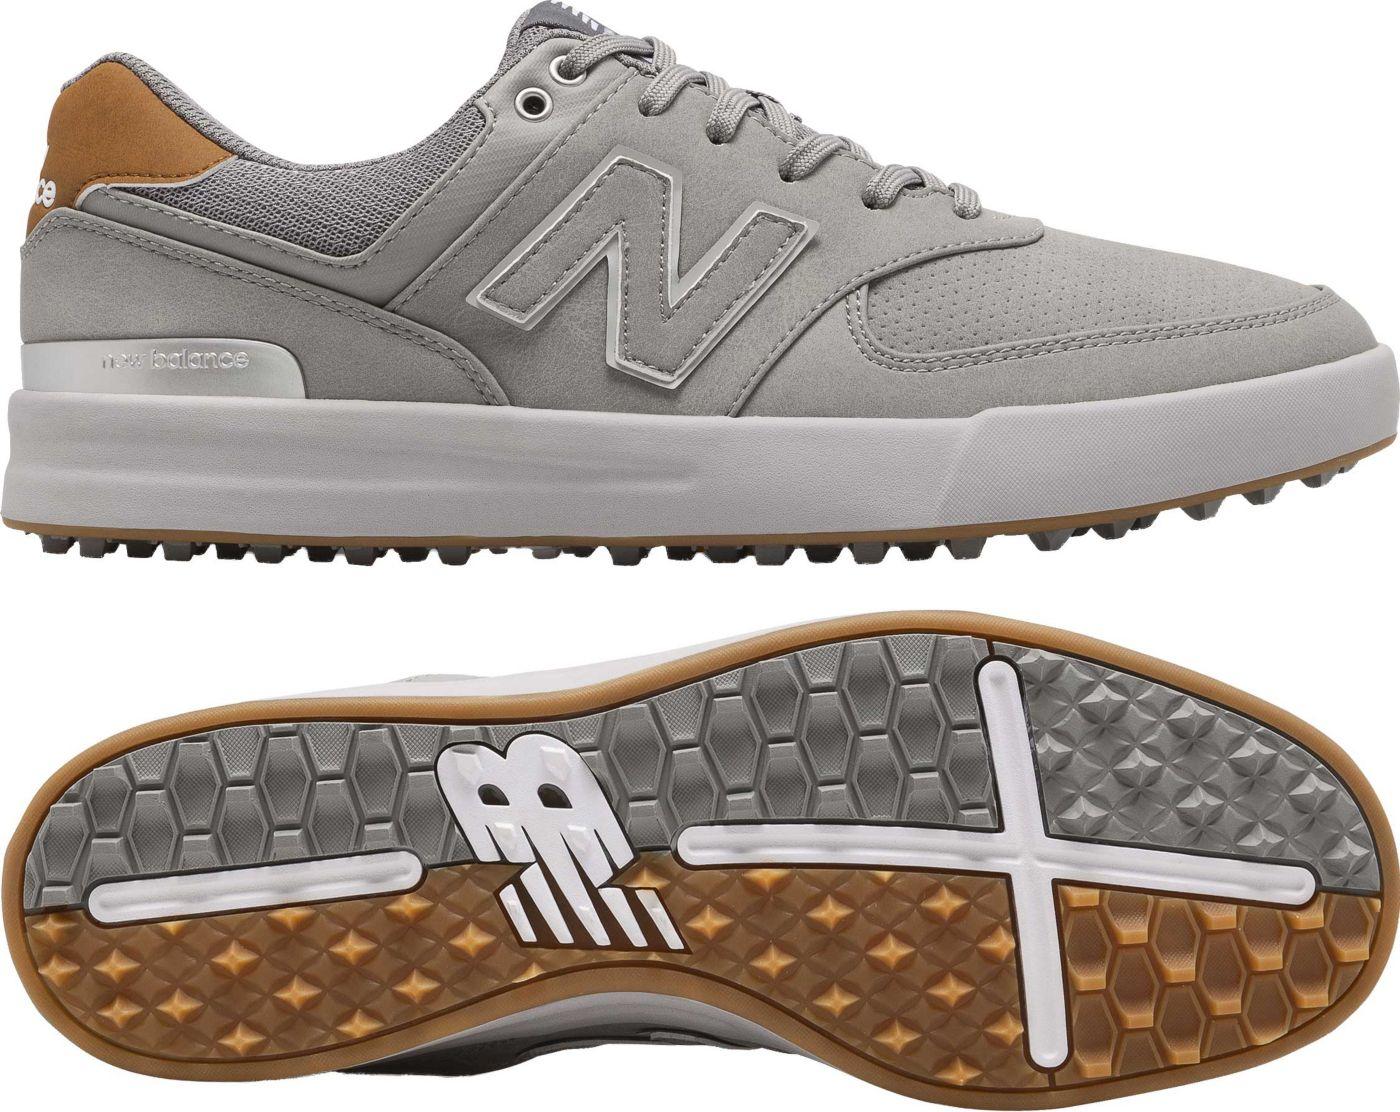 New Balance Men's 574 Greens Golf Shoes